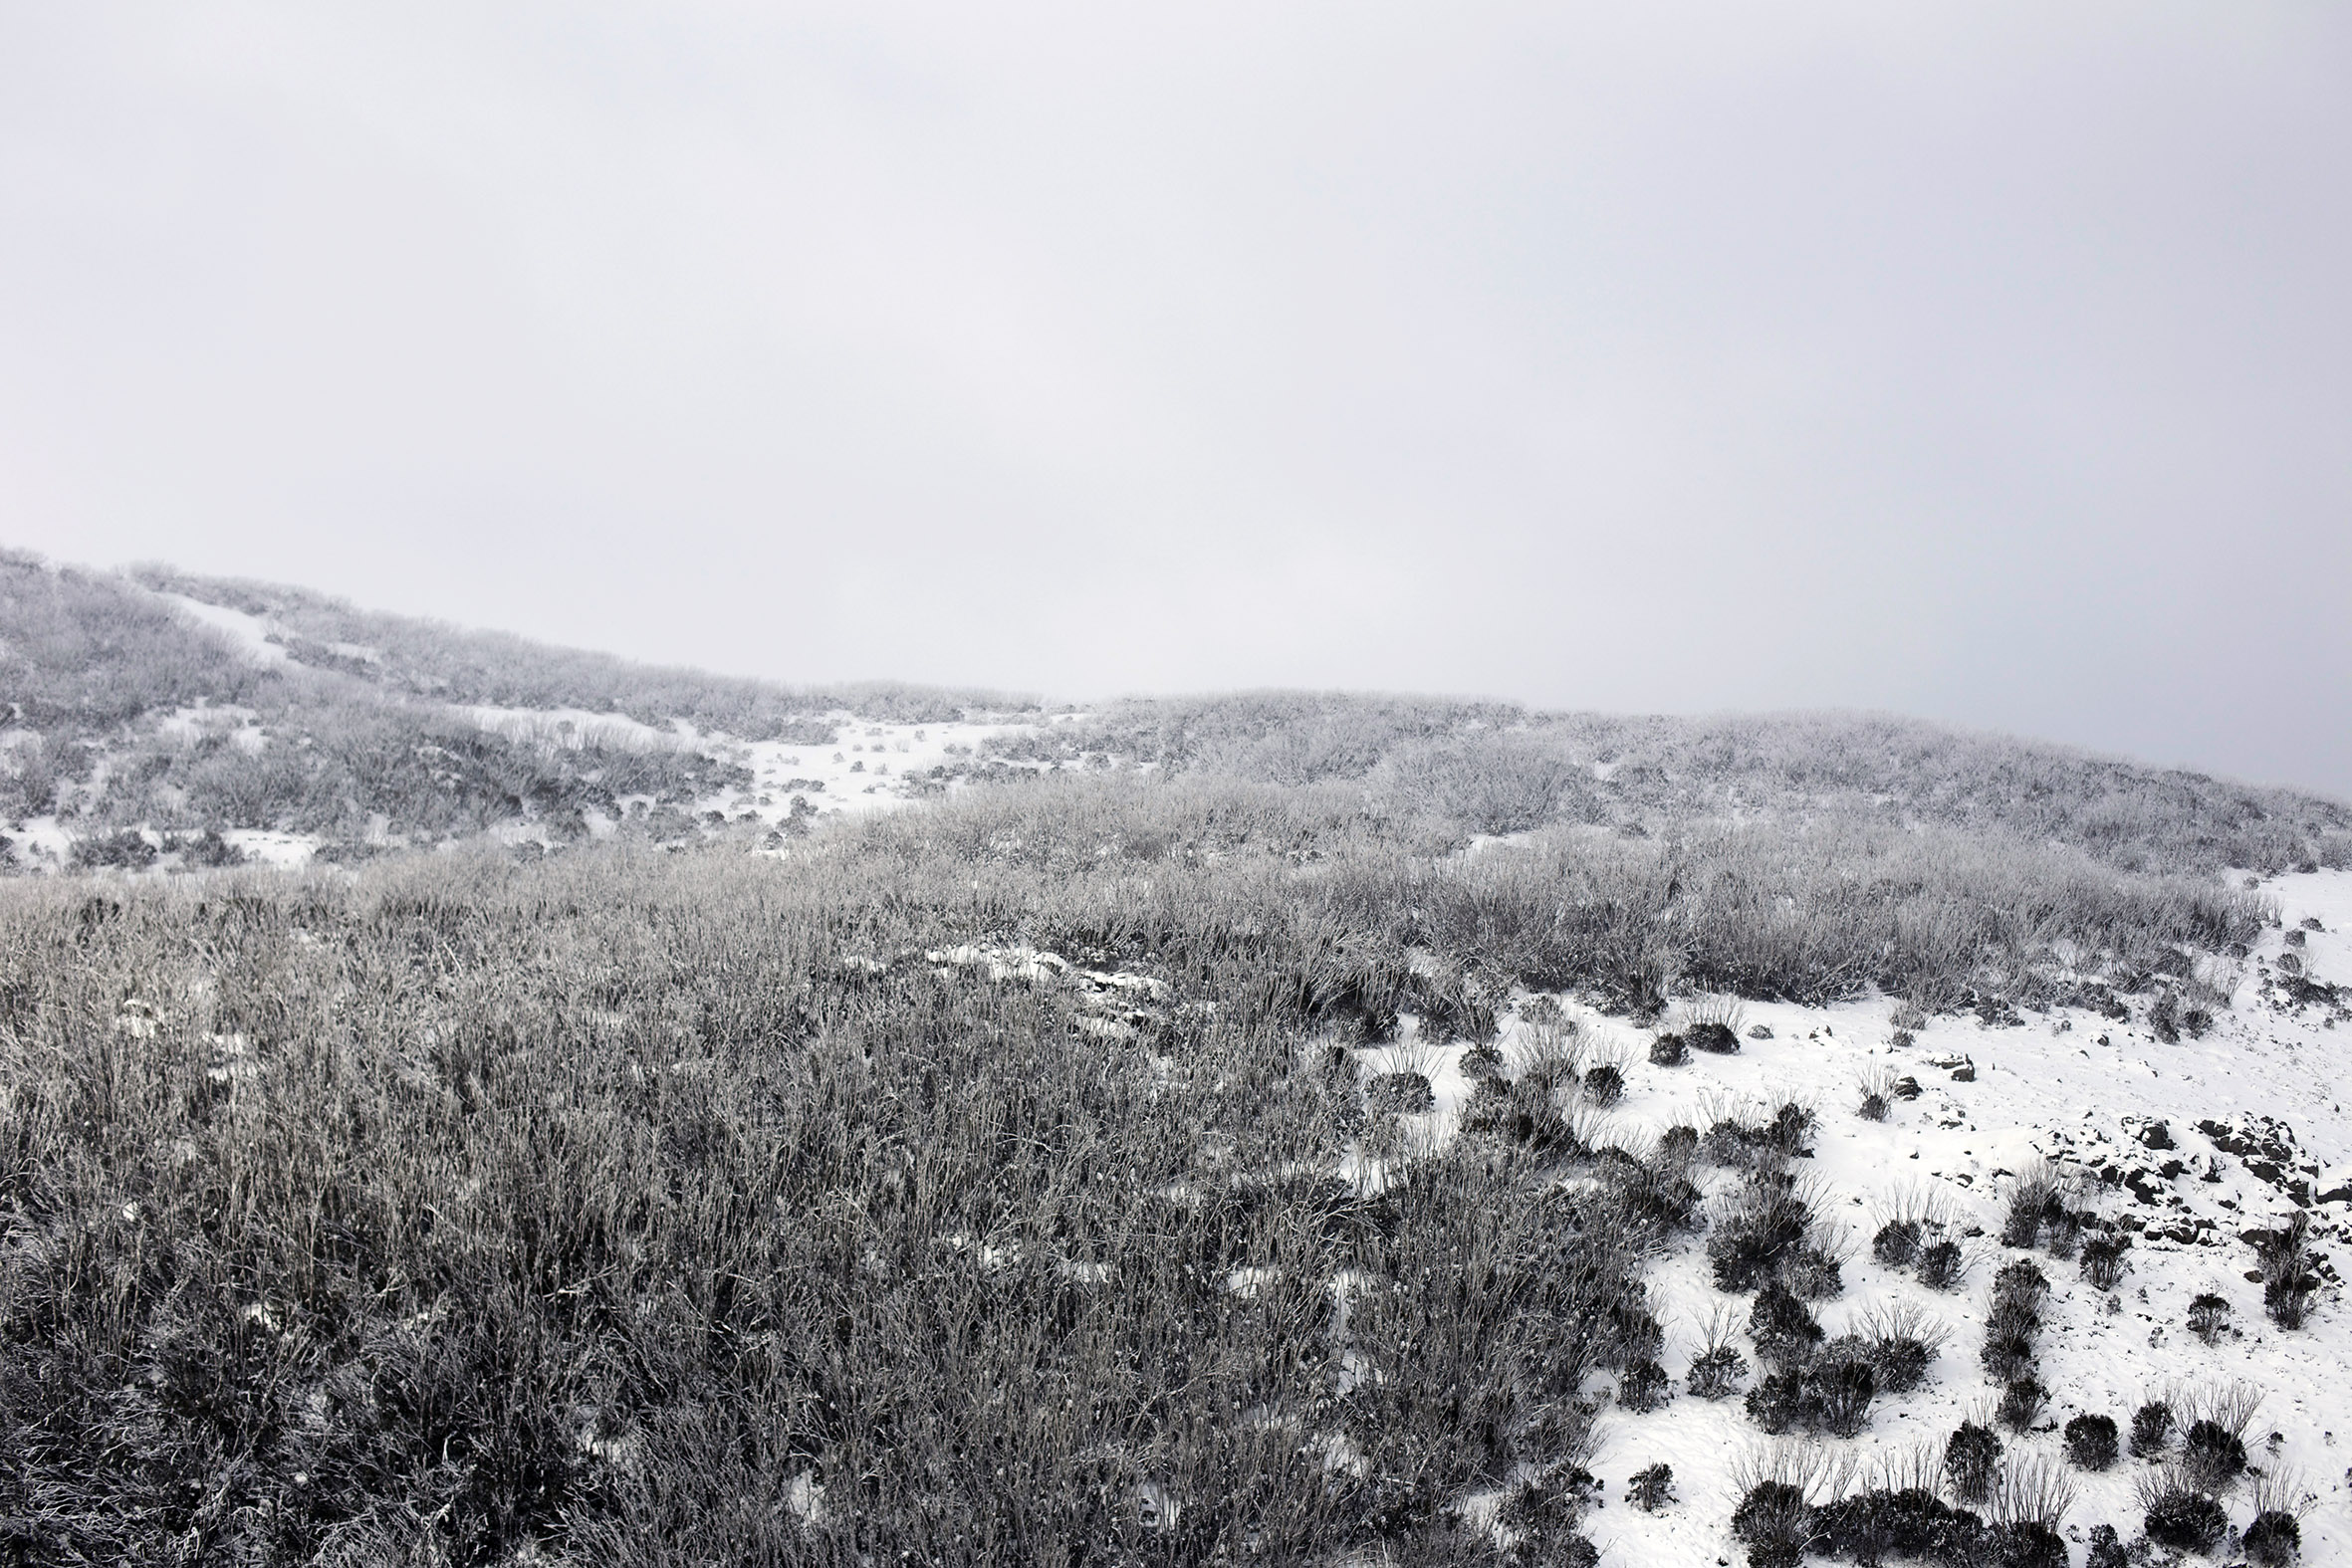 MB snow scape 3.jpg